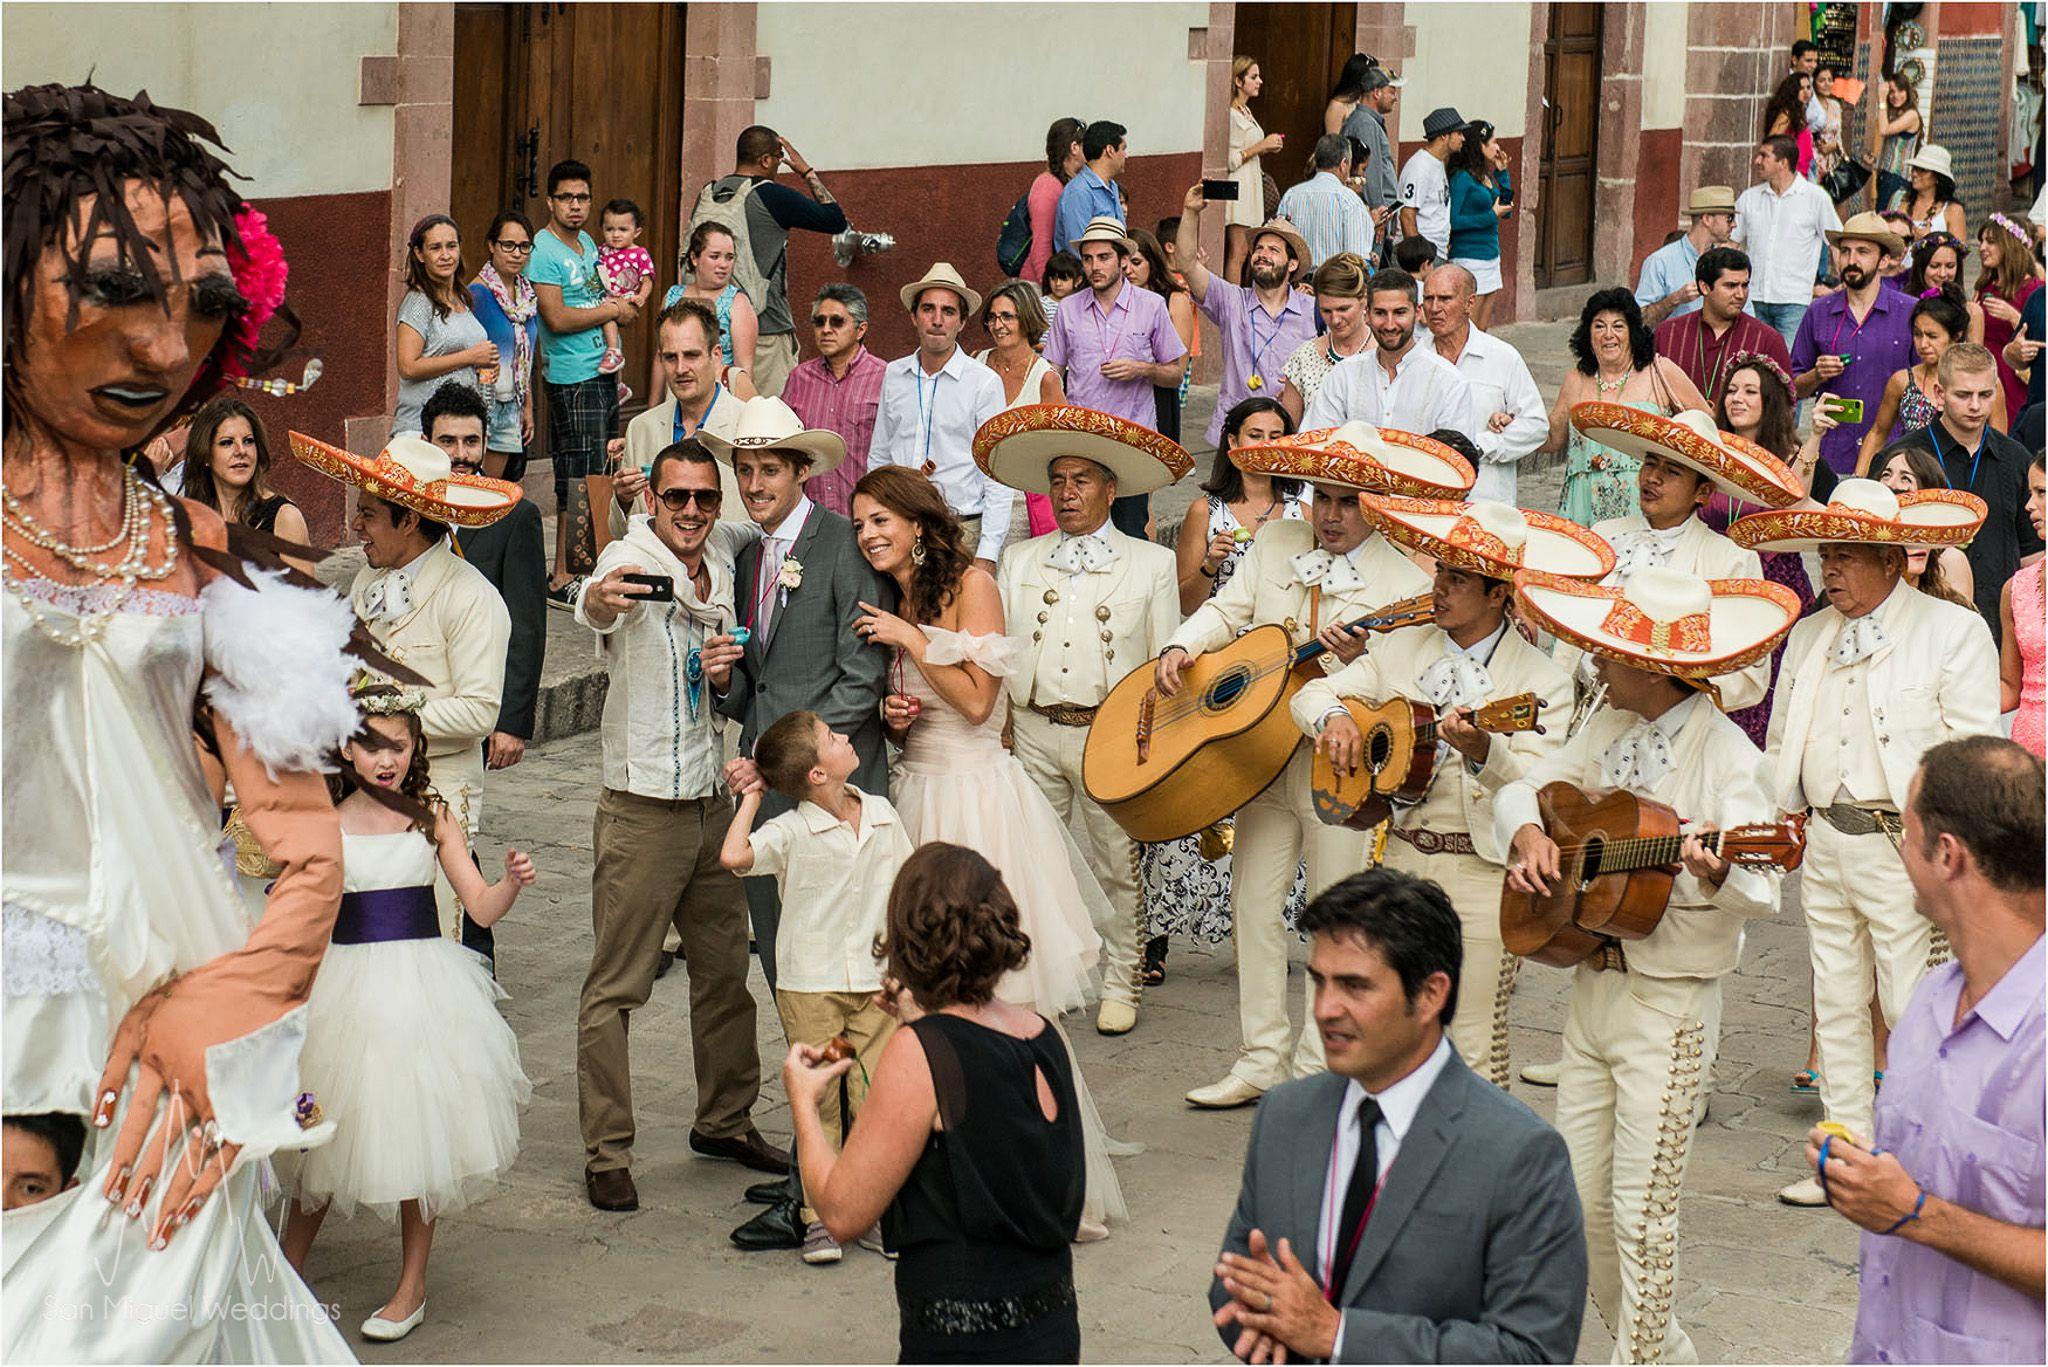 Isabelle and Constant's #weddingmarch or #callejoneada in #sanmigueldeallende #sanmiguelweddings